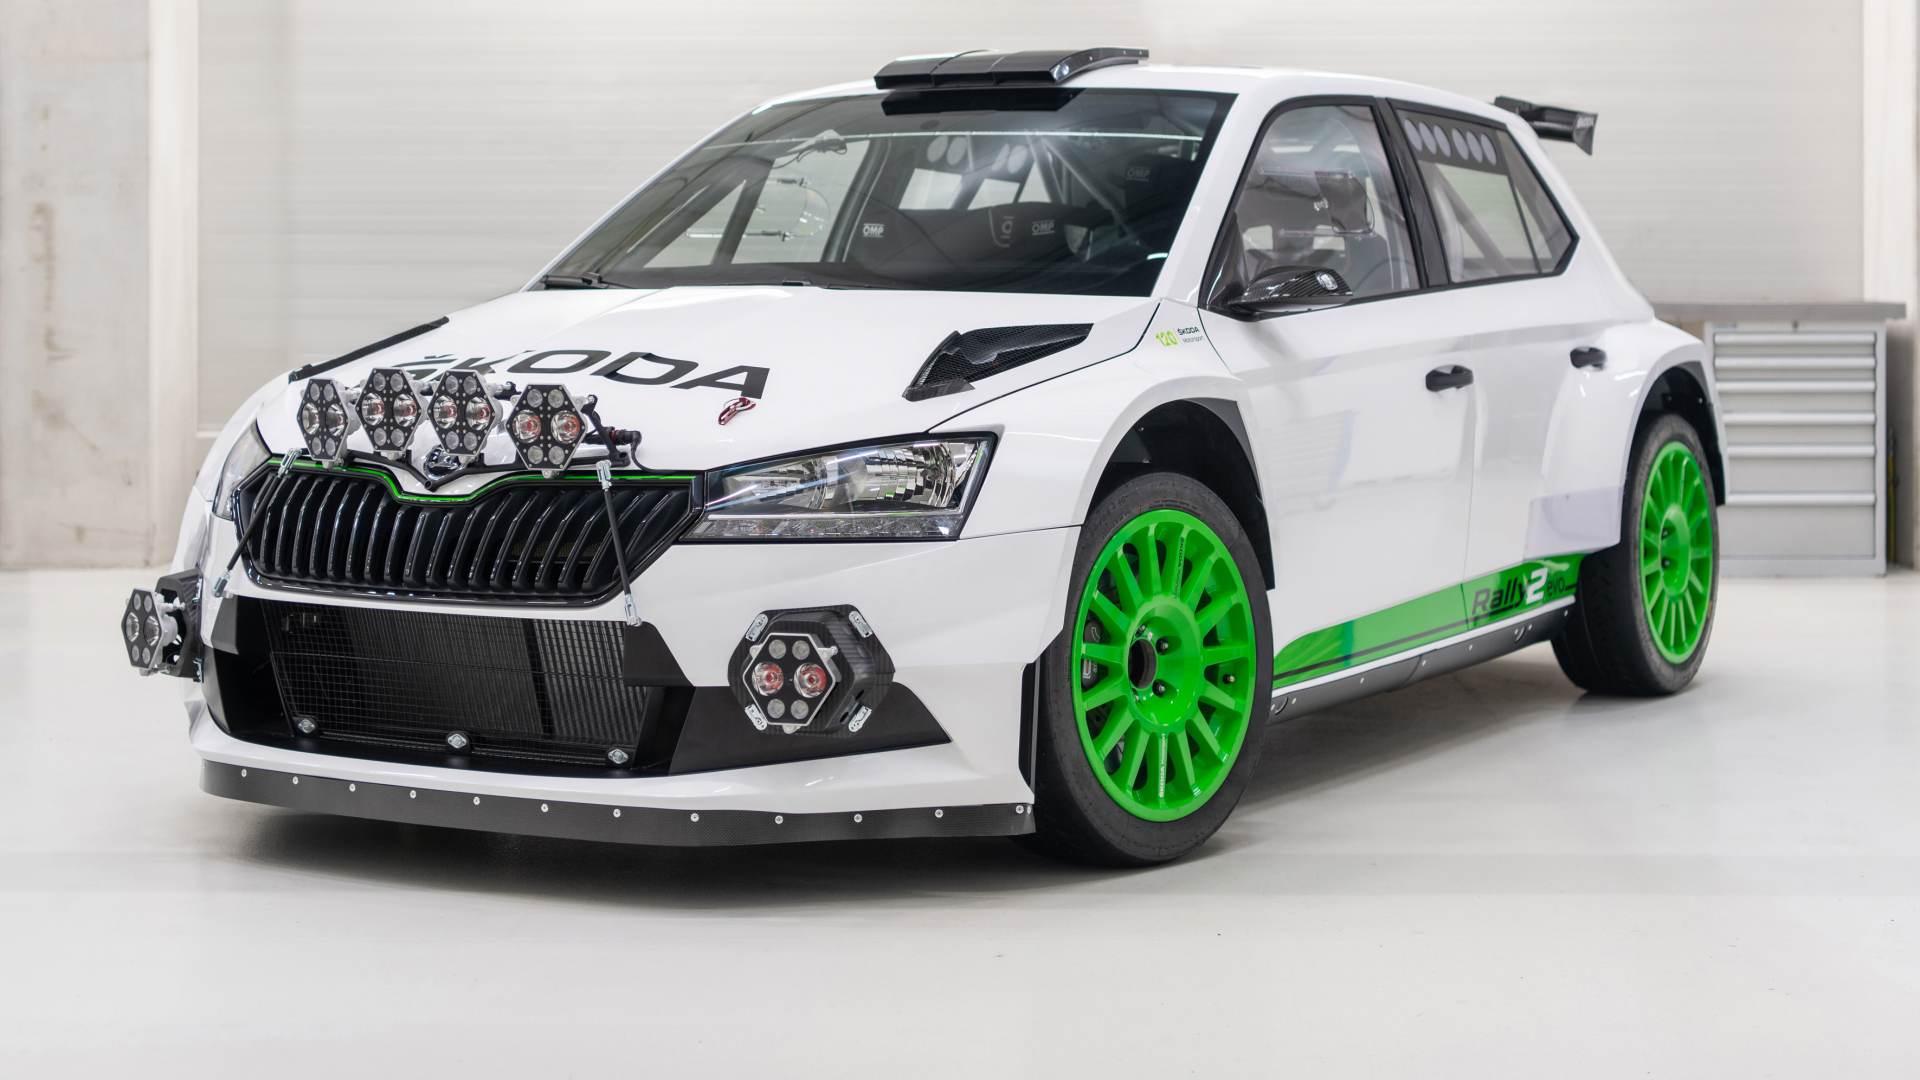 Skoda Fabia Rally2 evo 2021: edizione celebrativa da 290 CV